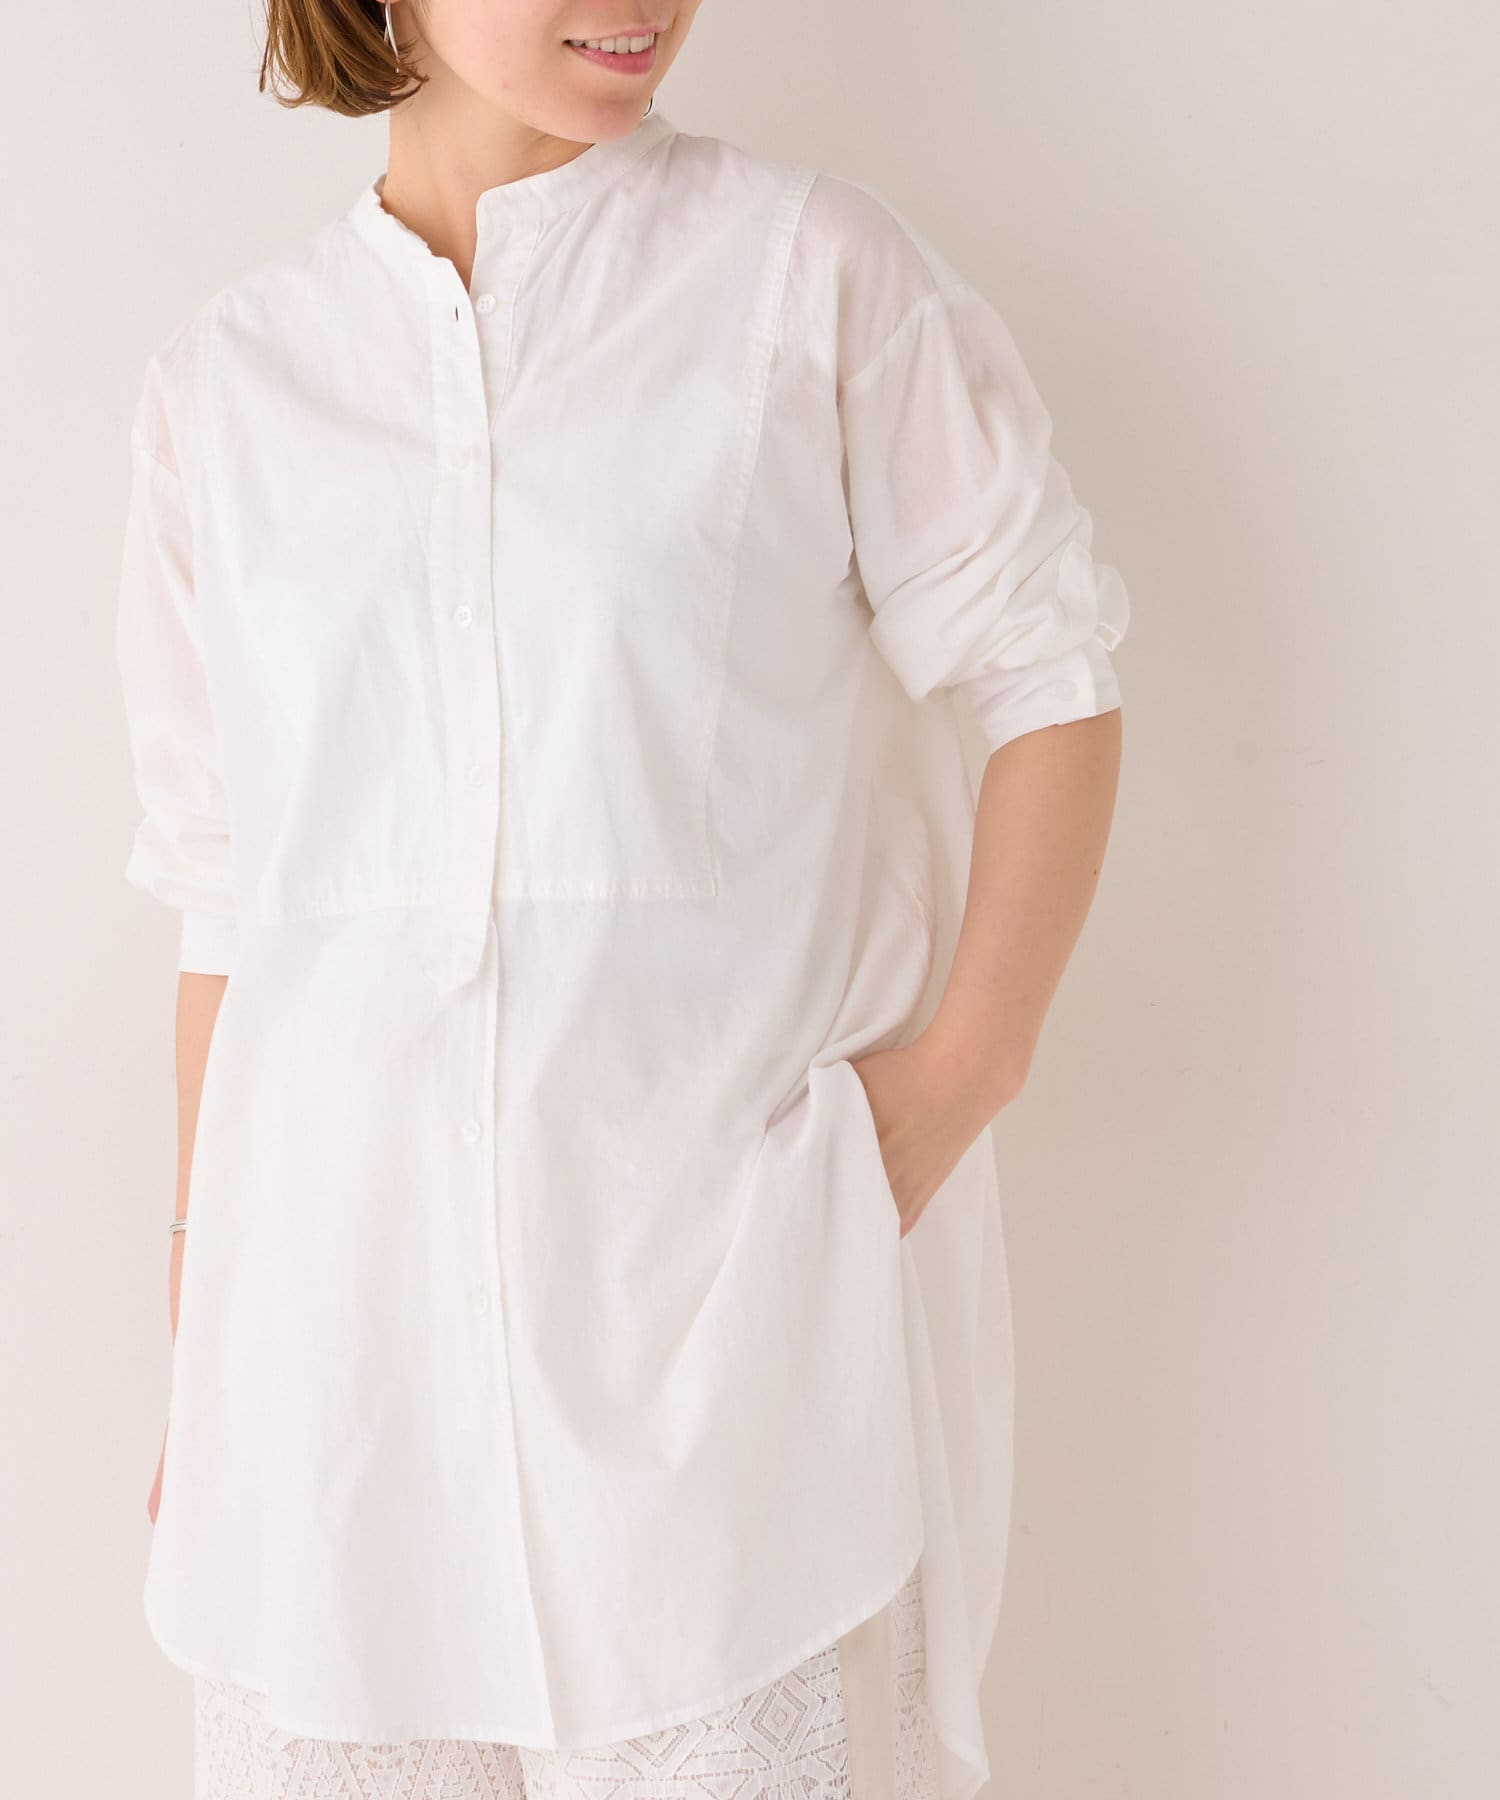 BONbazaar(ボンバザール) ≪一押し≫綿製品染めブラウス◆